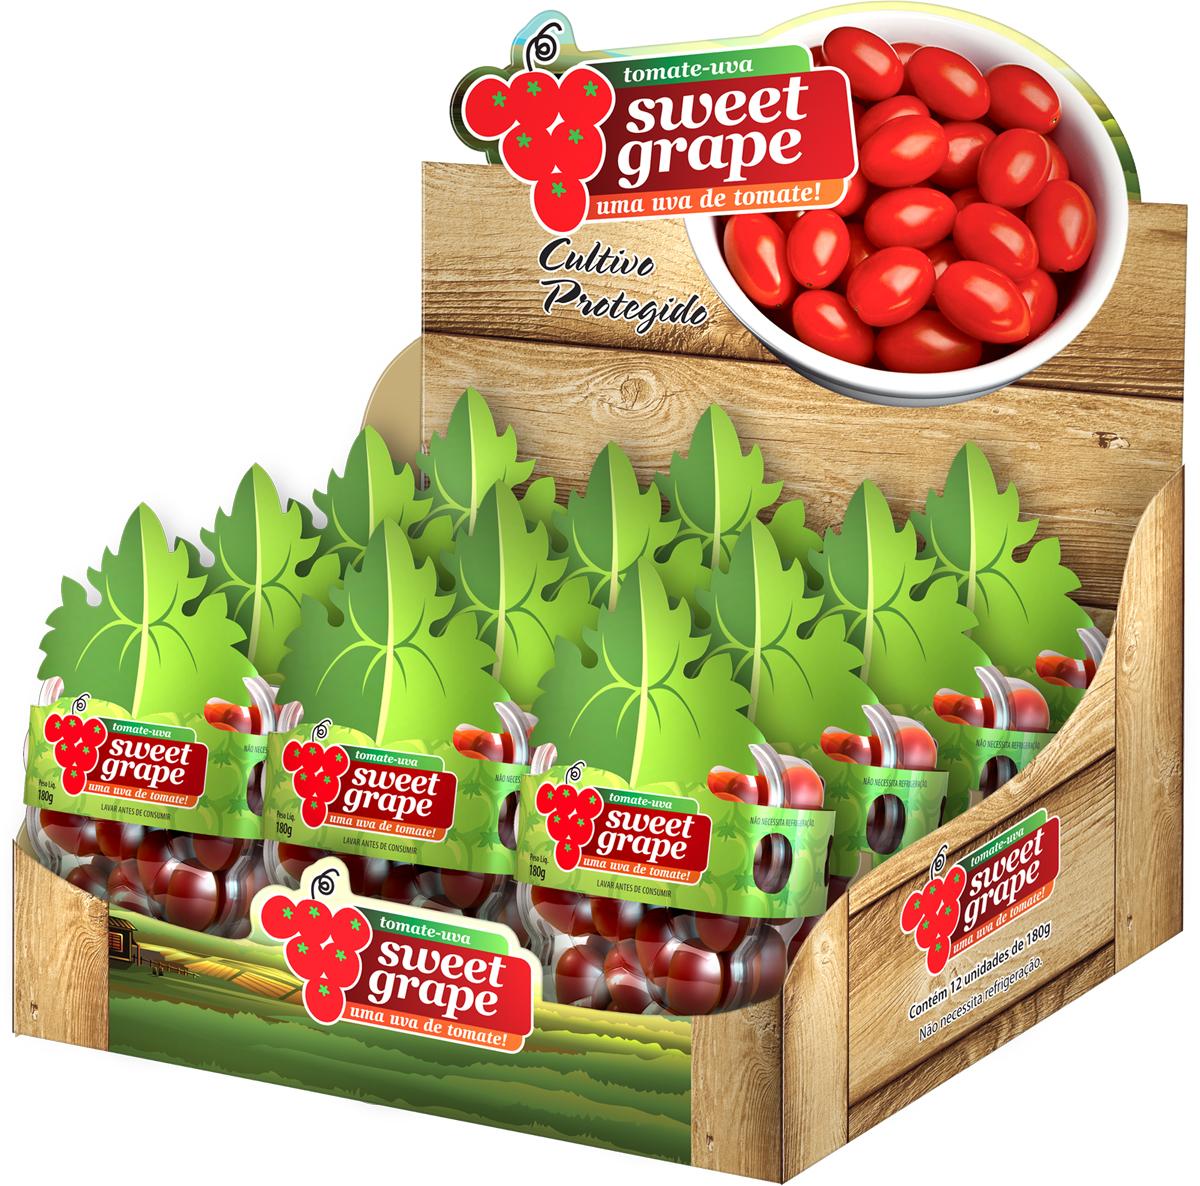 Design de Bandeja para tomates SWEET GRAPE - caixa display